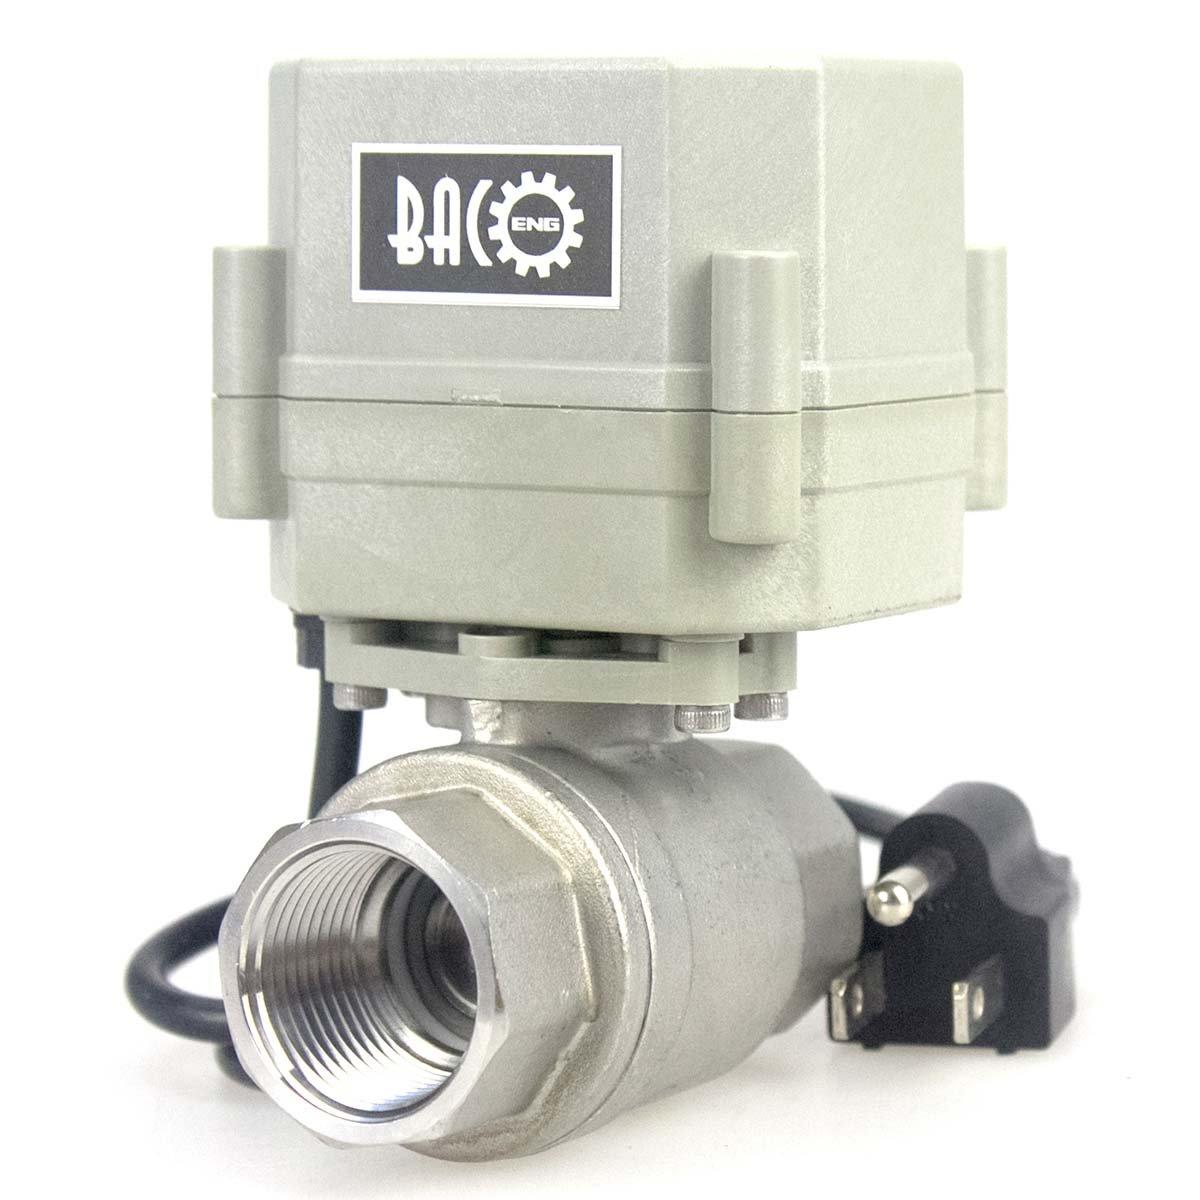 BACOENG 3/4'' 110V/220V NC Motorized Ball Valve, NO/NC 2/3 Way BRASS/SS 1/2''-1'' Available